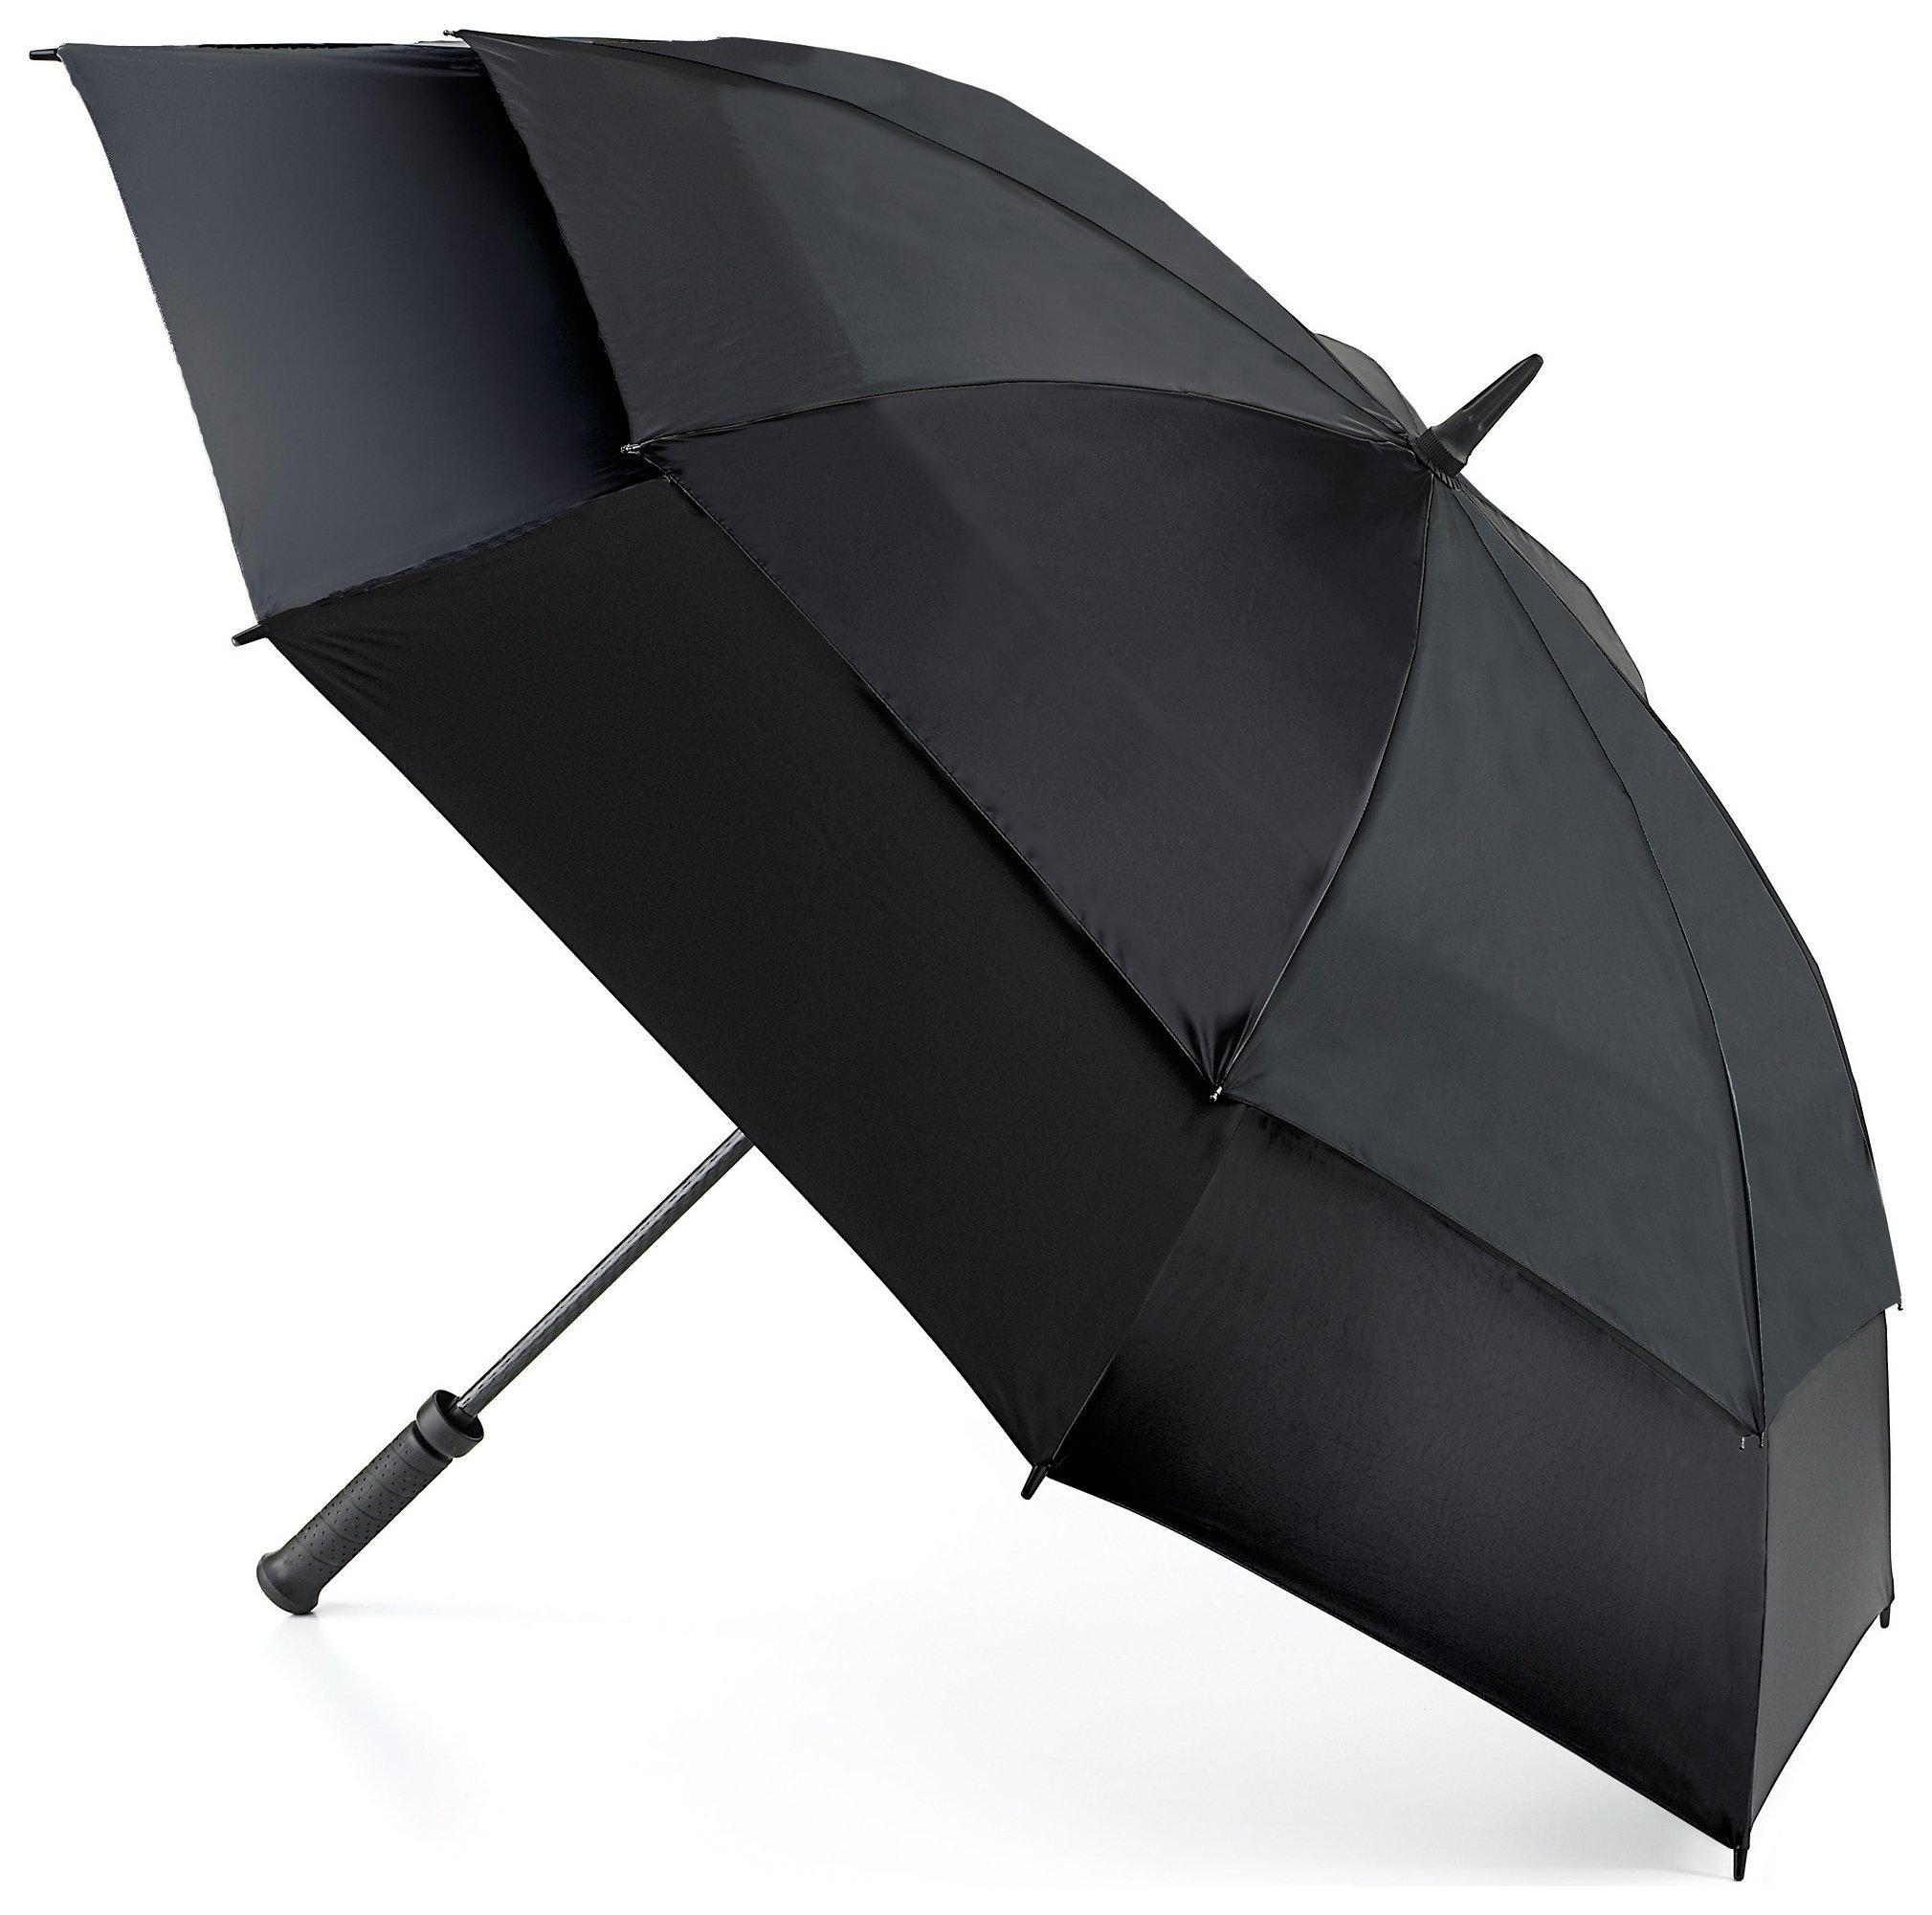 Fulton Stormshield Umbrella - Black